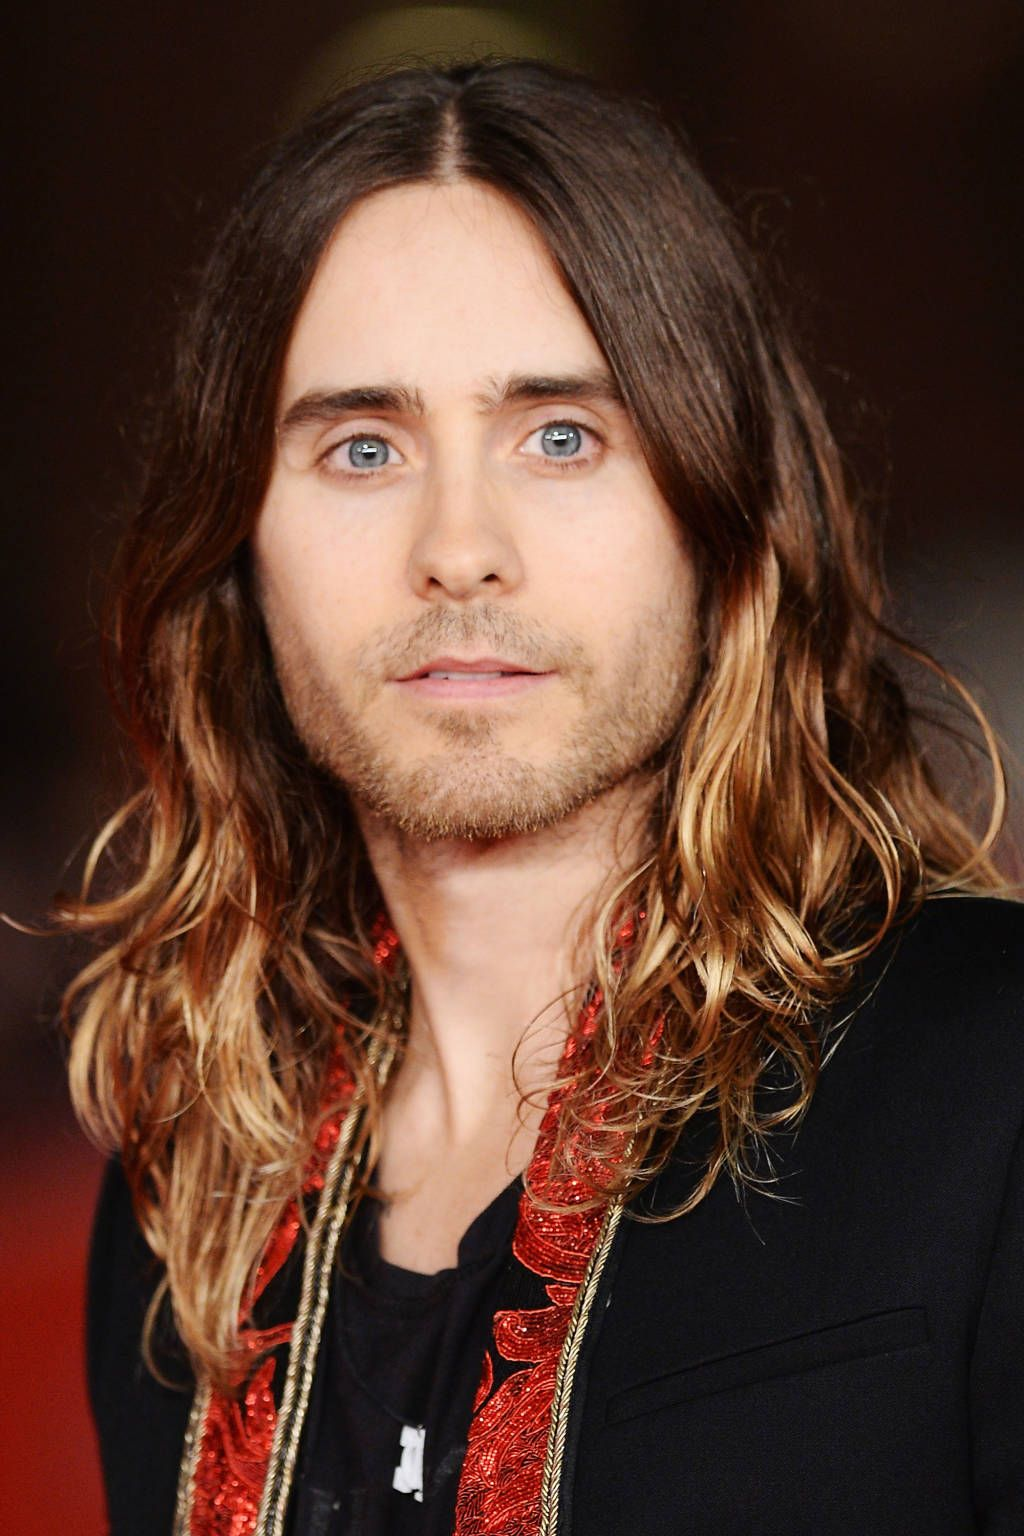 Jared Leto Hair Transformation - 26 Jared Leto Hairstyles - Harper's BAZAAR